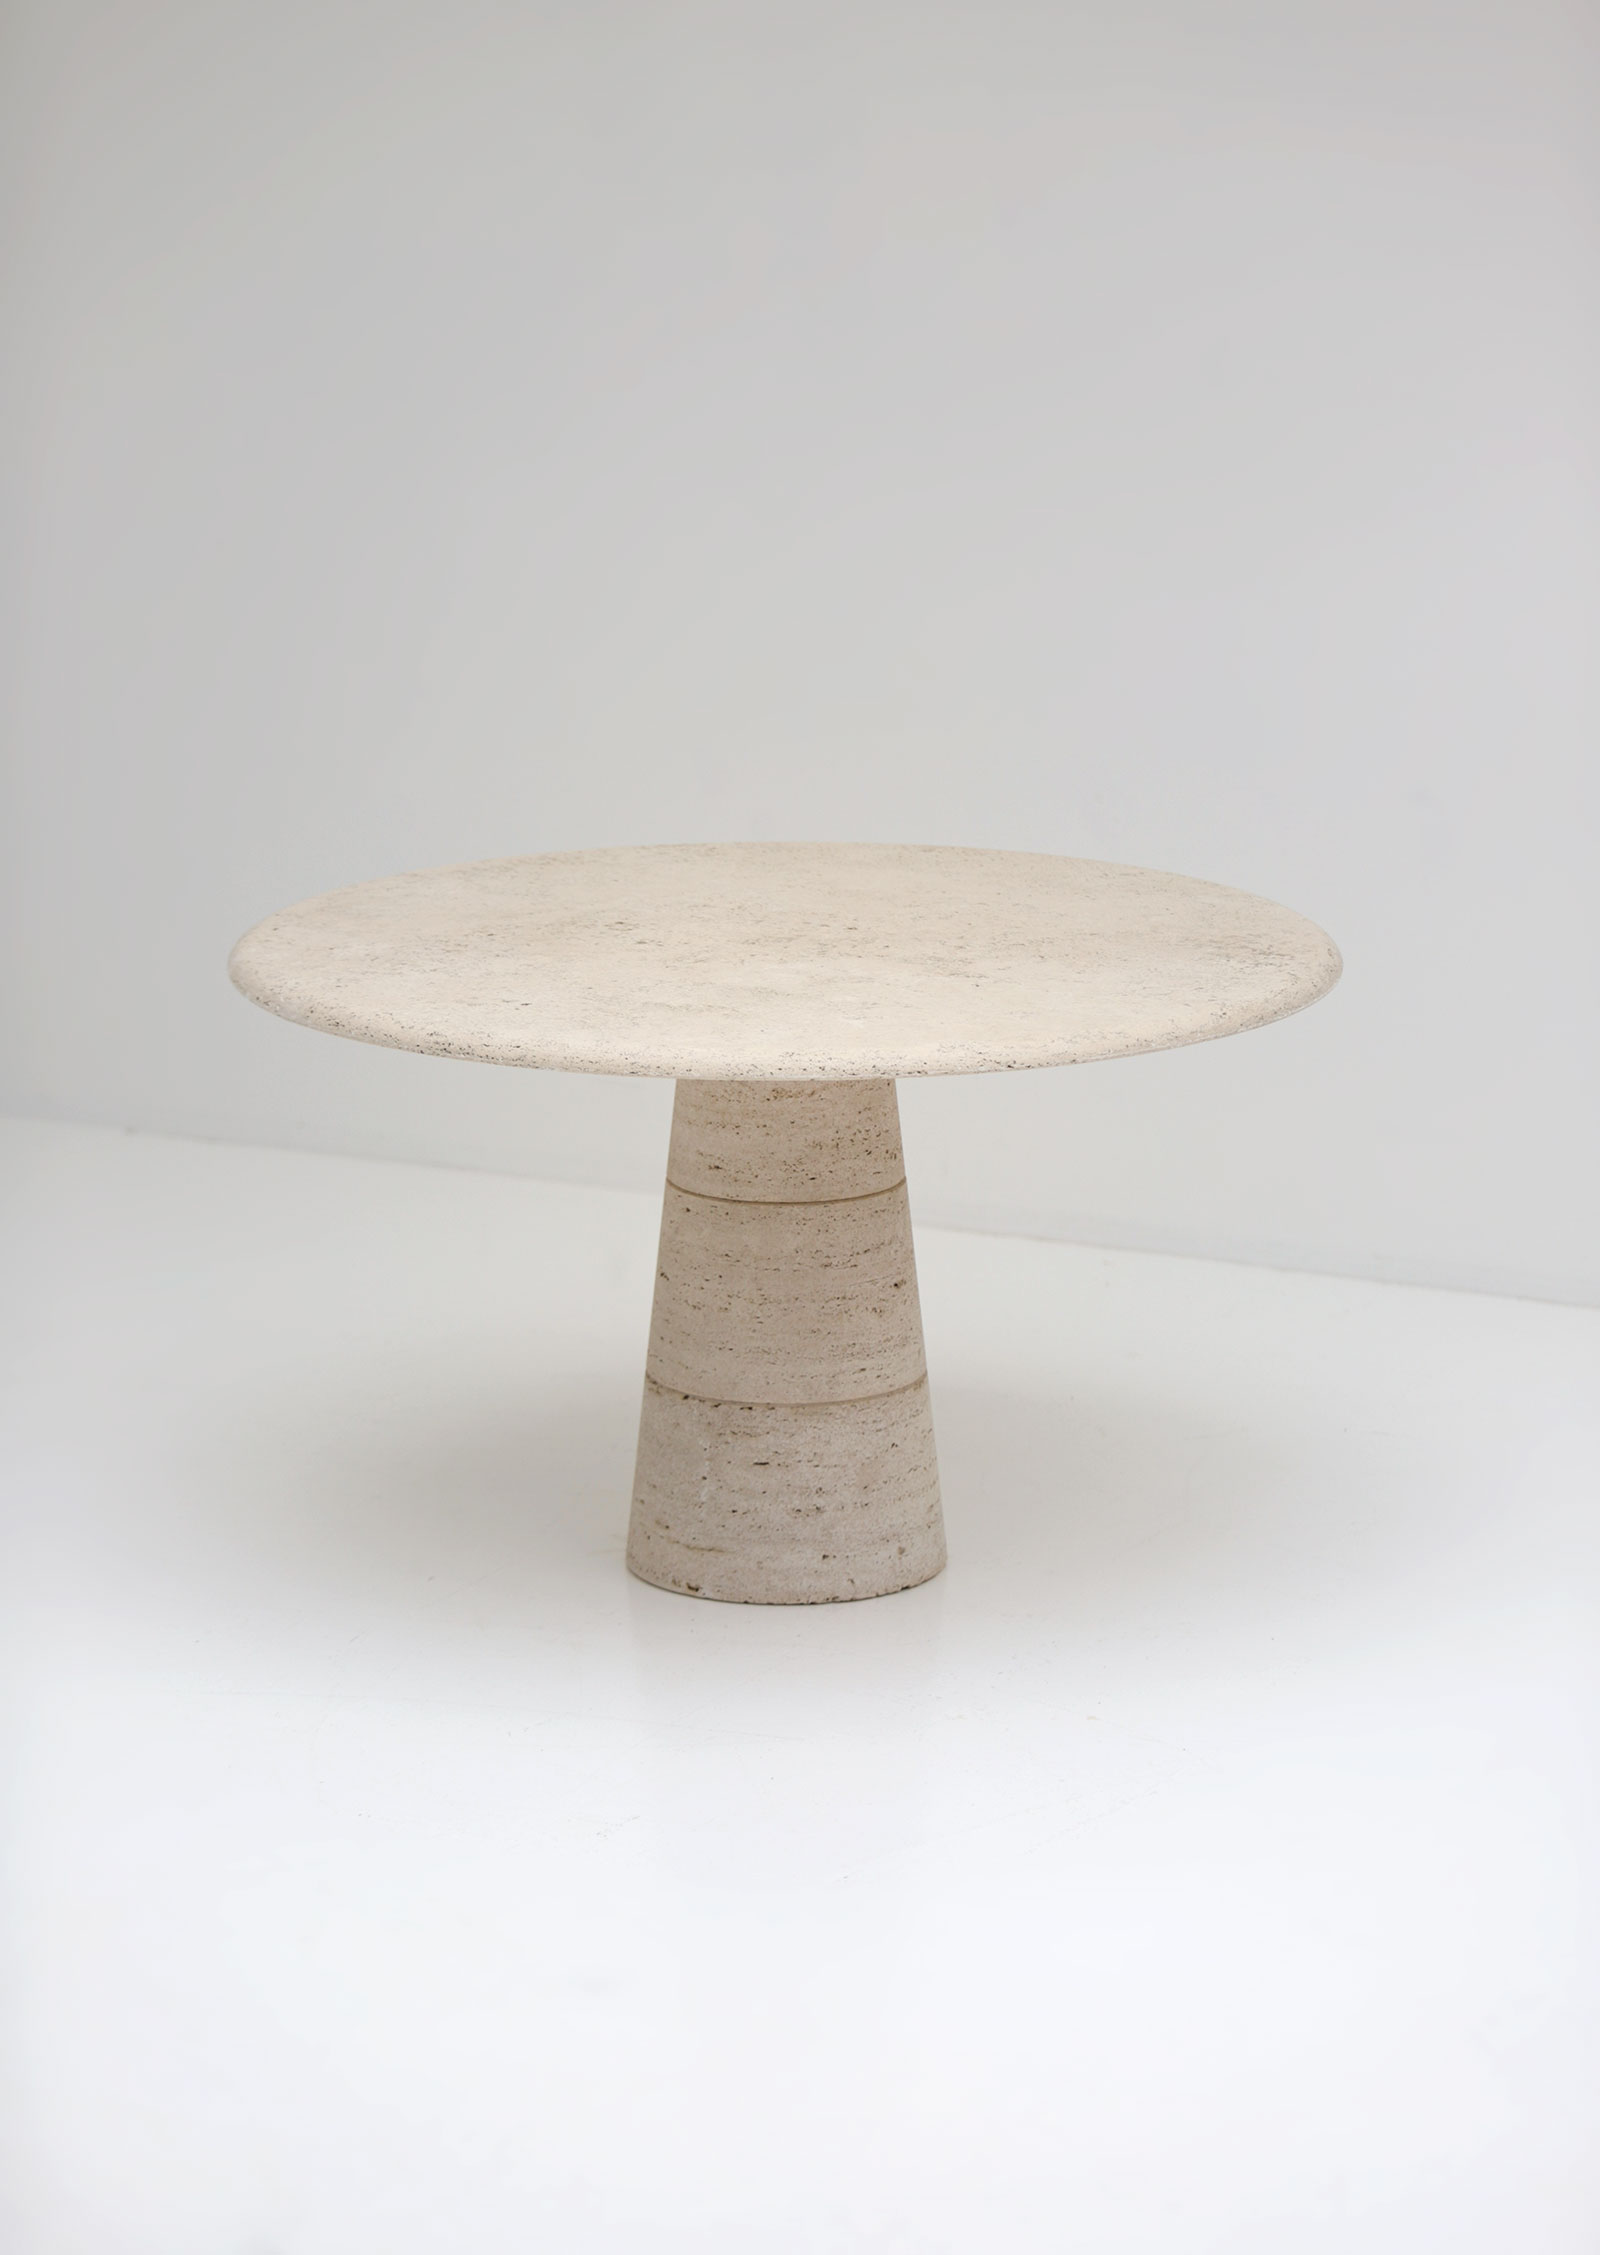 Travertin Round Dining Table Up&Upimage 3